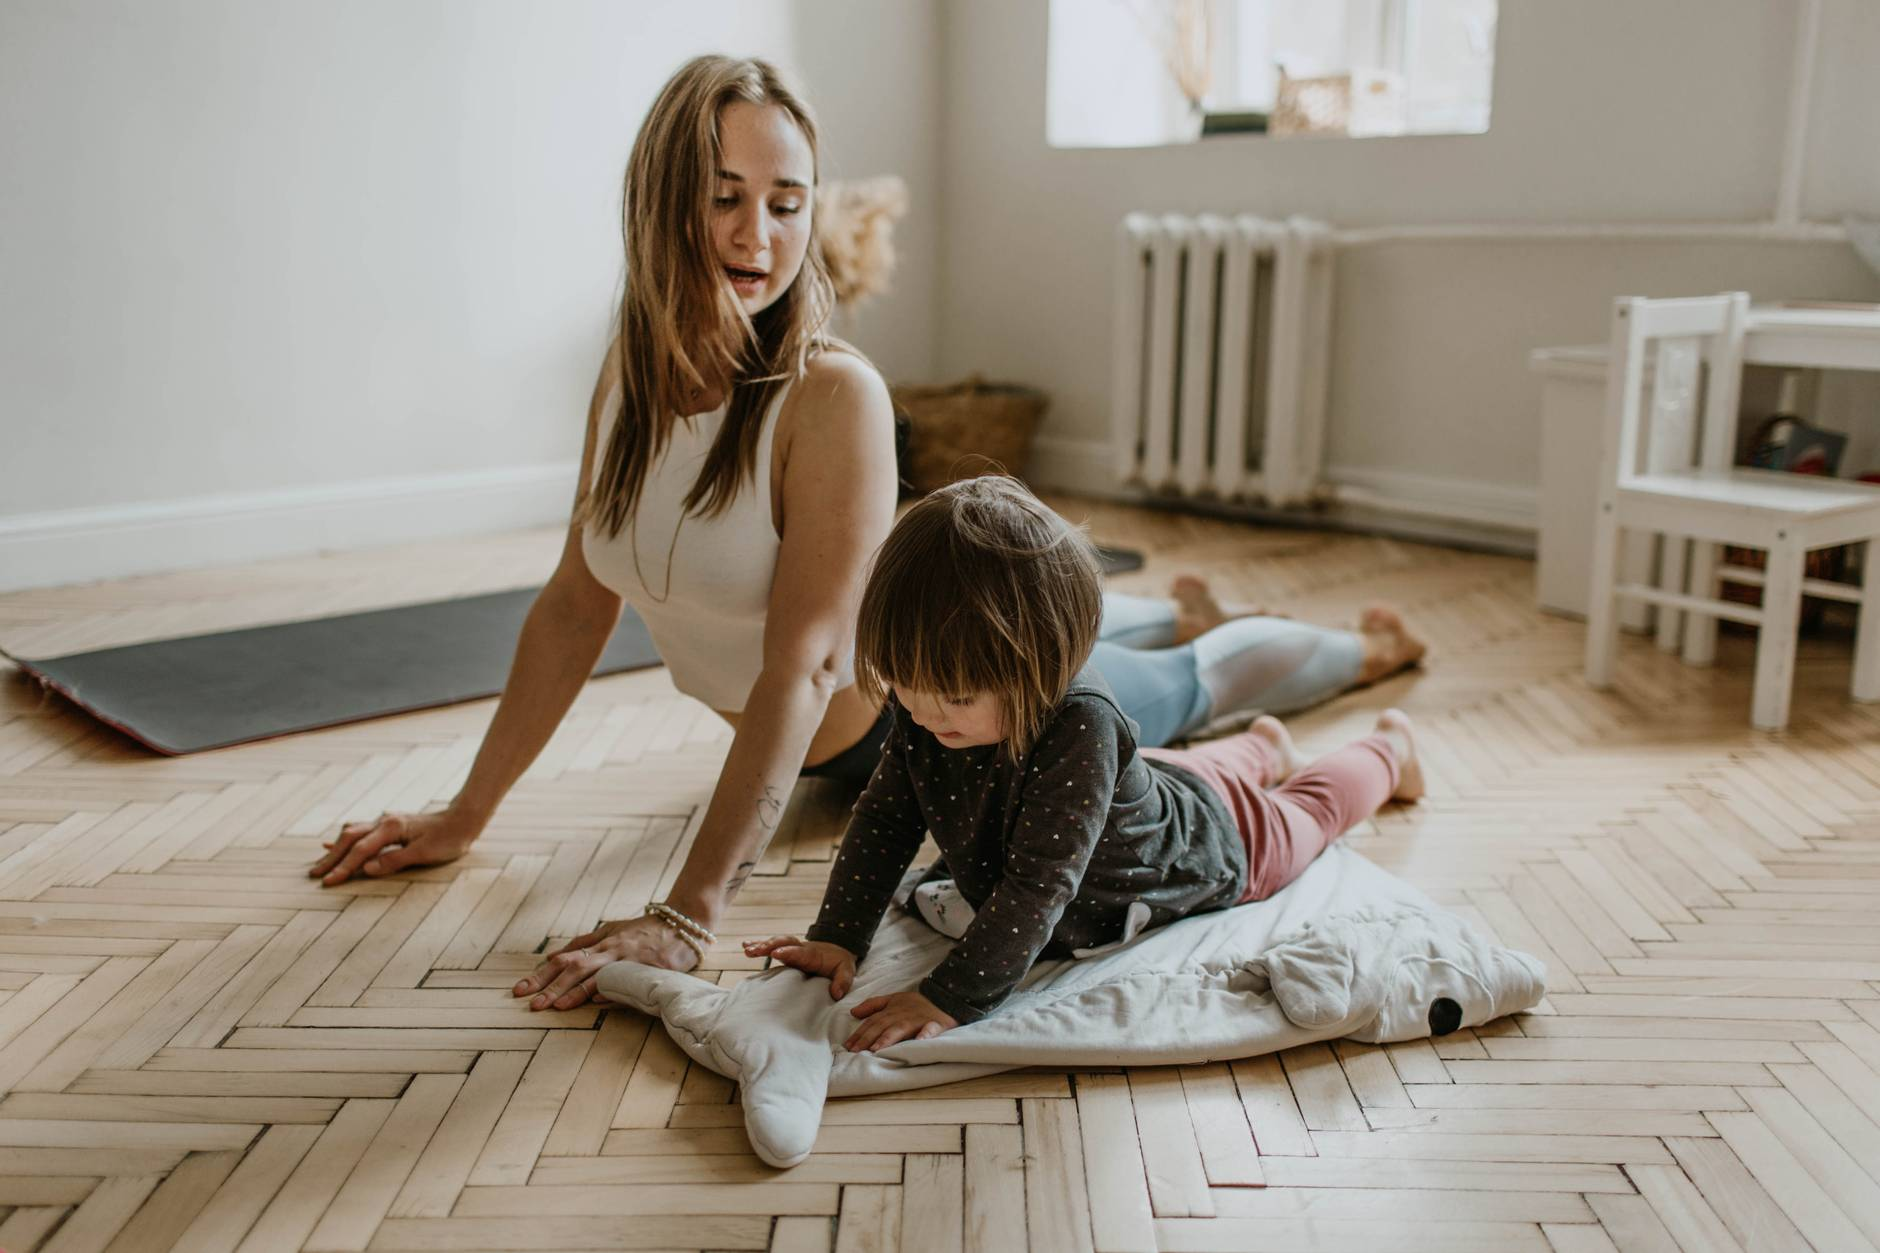 hatha yoga, physical fitness, mom daughter doing yoga, cute yoga photos, hatha yog for pranamaya kosha